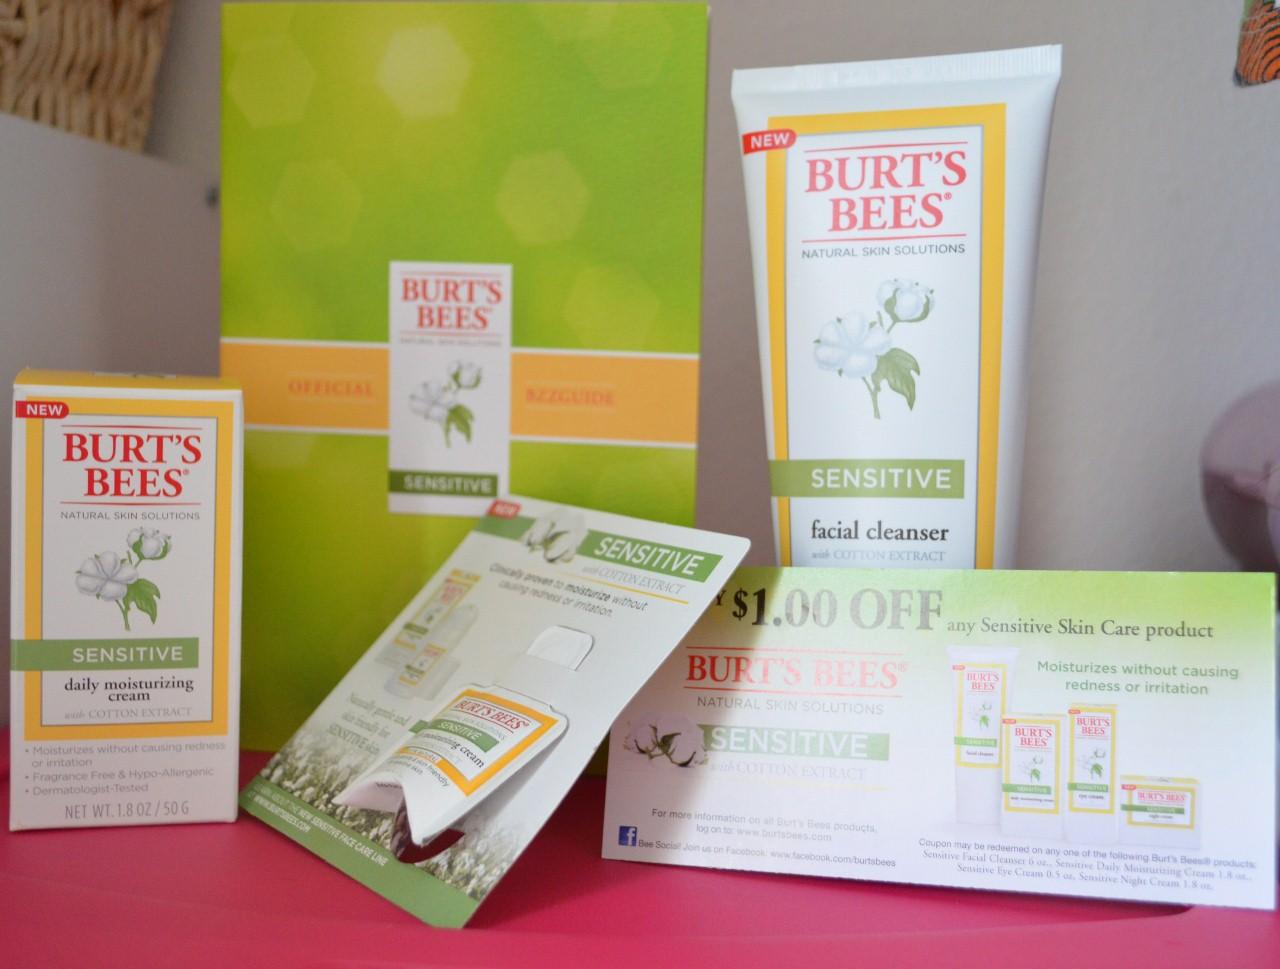 Burt's Bees Natural Skin Solutions Sensitive BzzKit